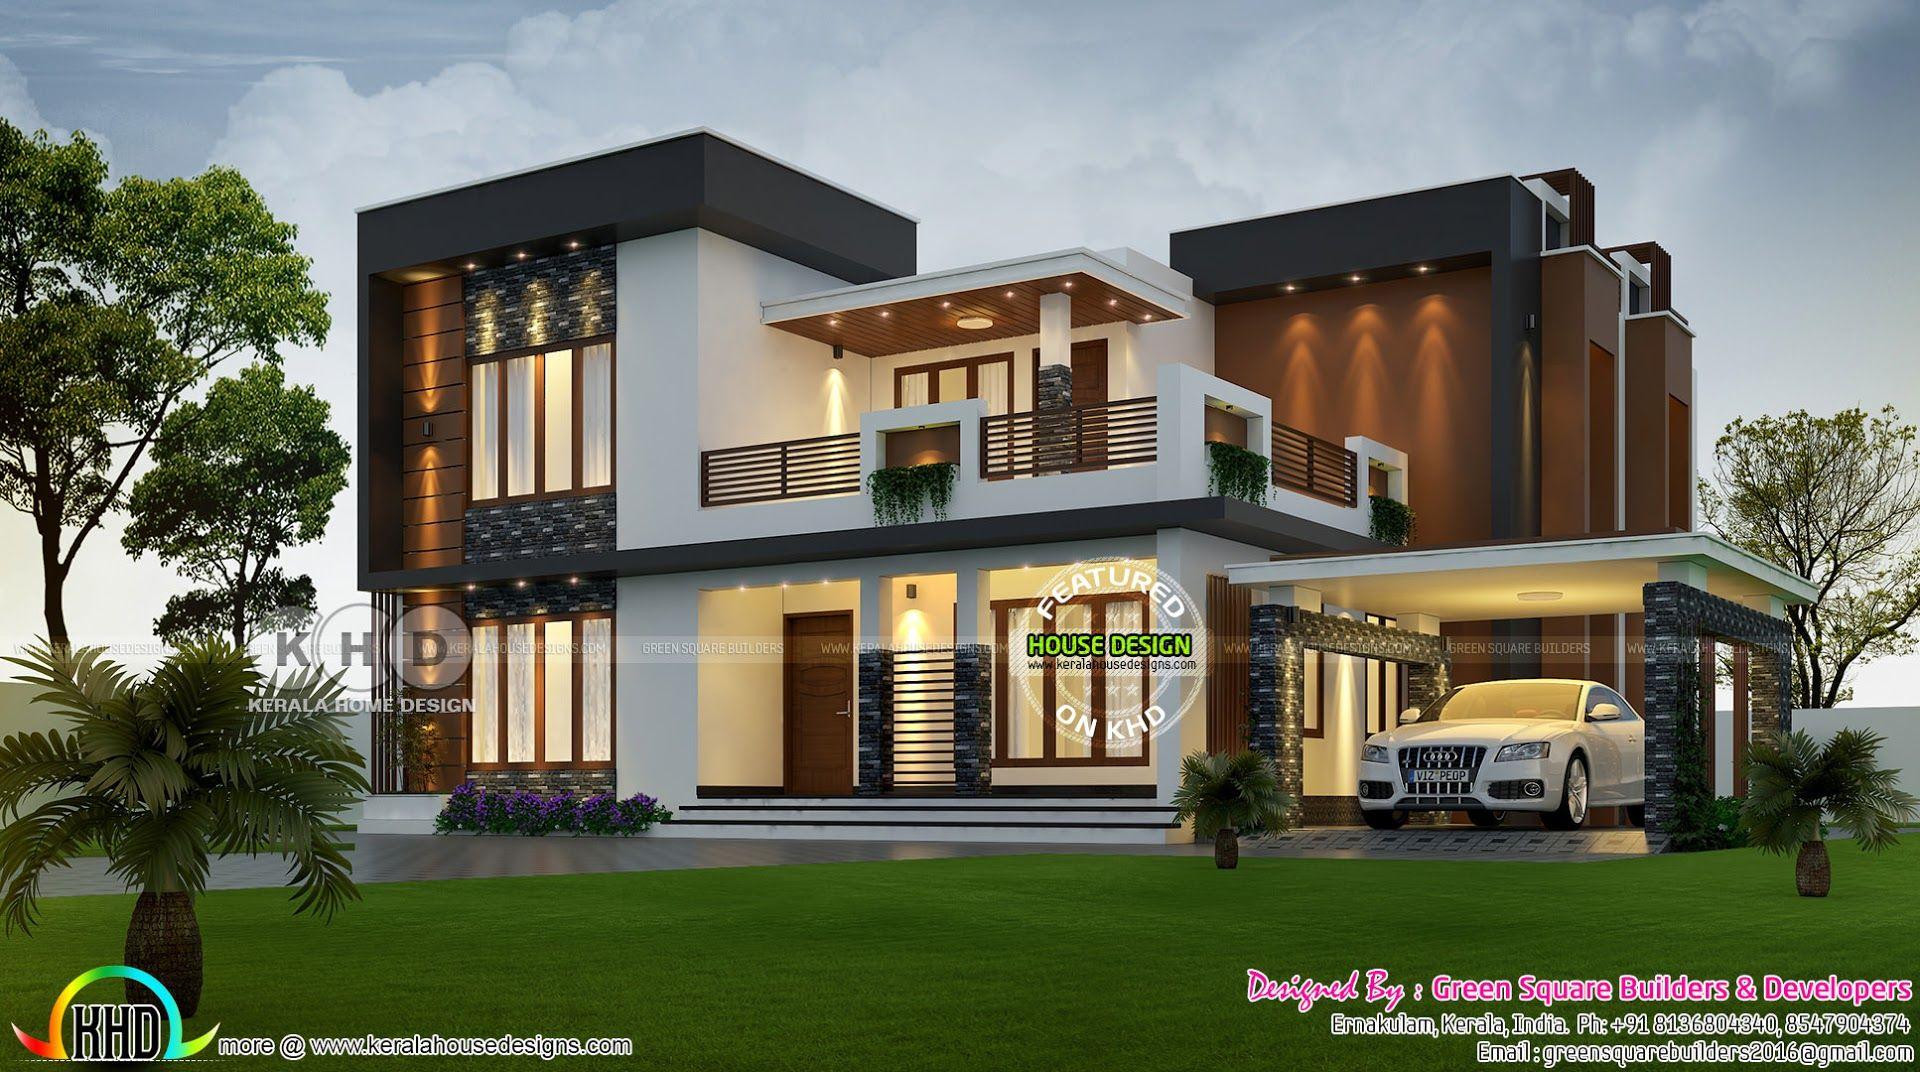 greensquare-home-design-september2018.jpg (1920×1072 ...